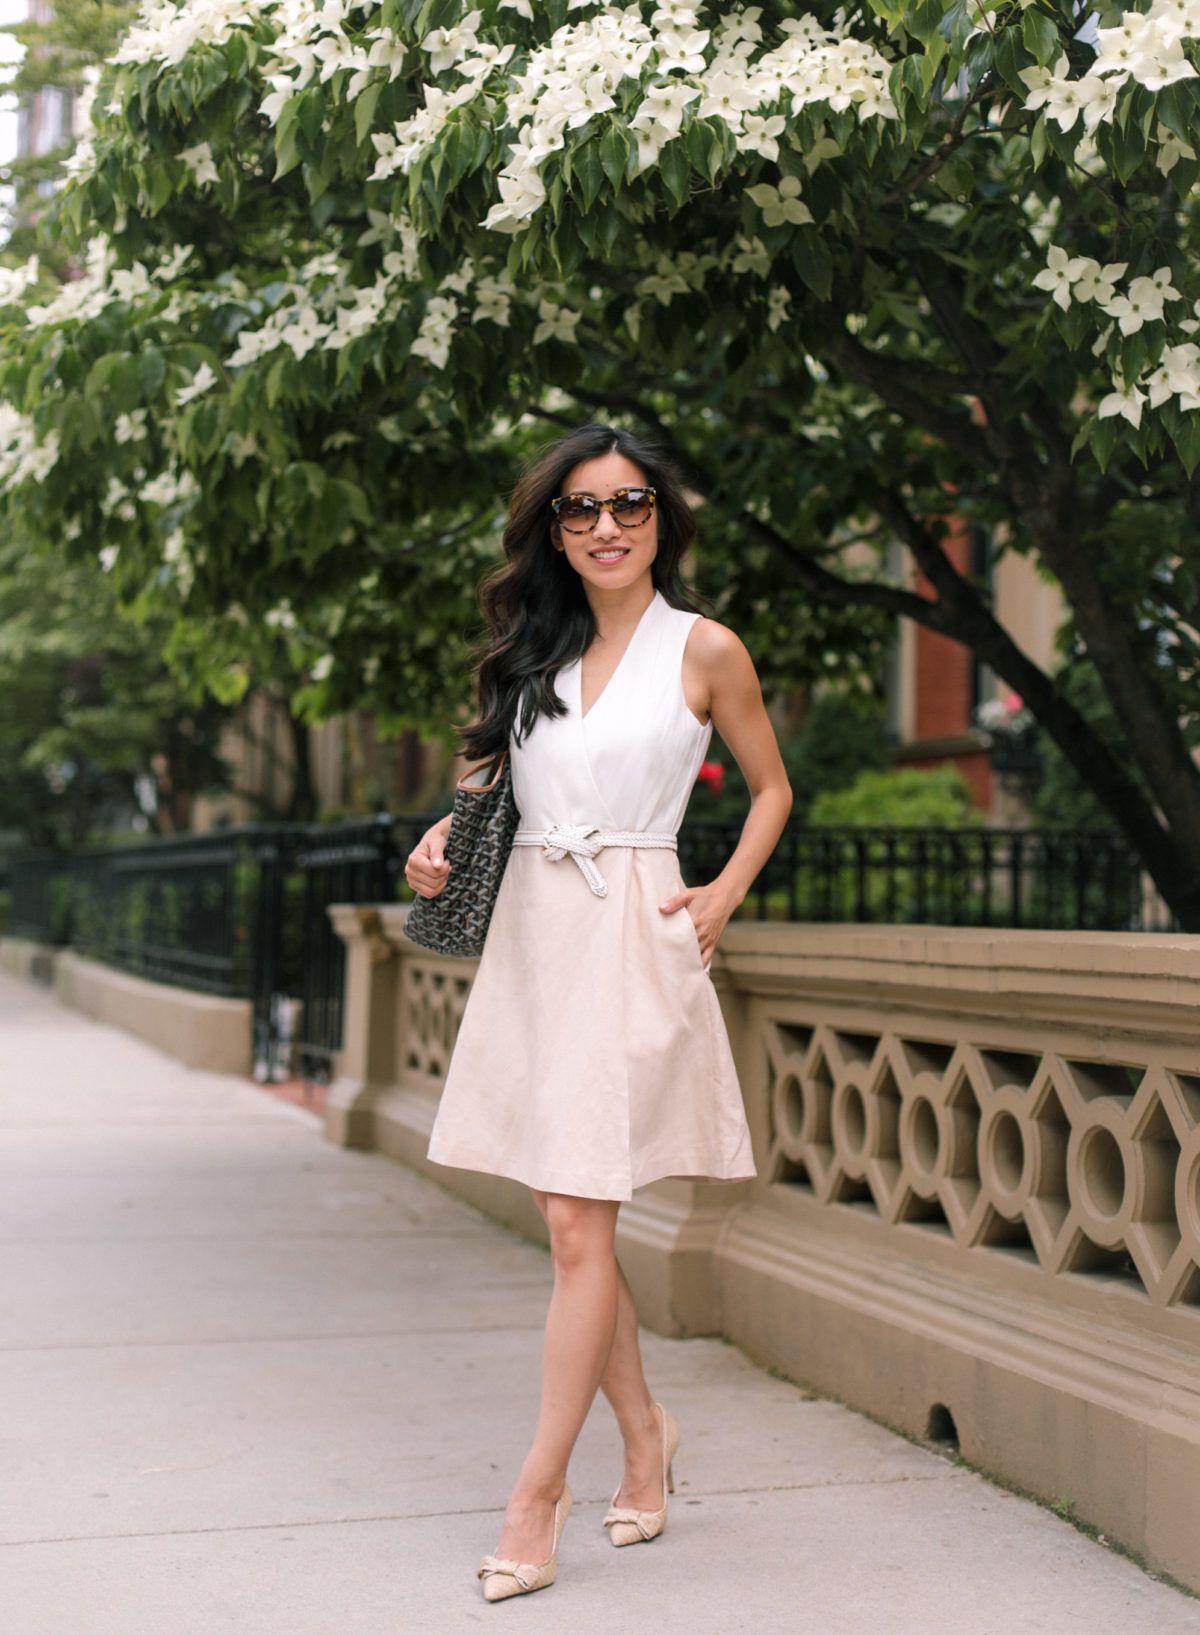 Ann Taylor Petites Summer Workwear Boston Fashion Blog Fashion Boston Fashion Petite Fashion [ 1635 x 1200 Pixel ]